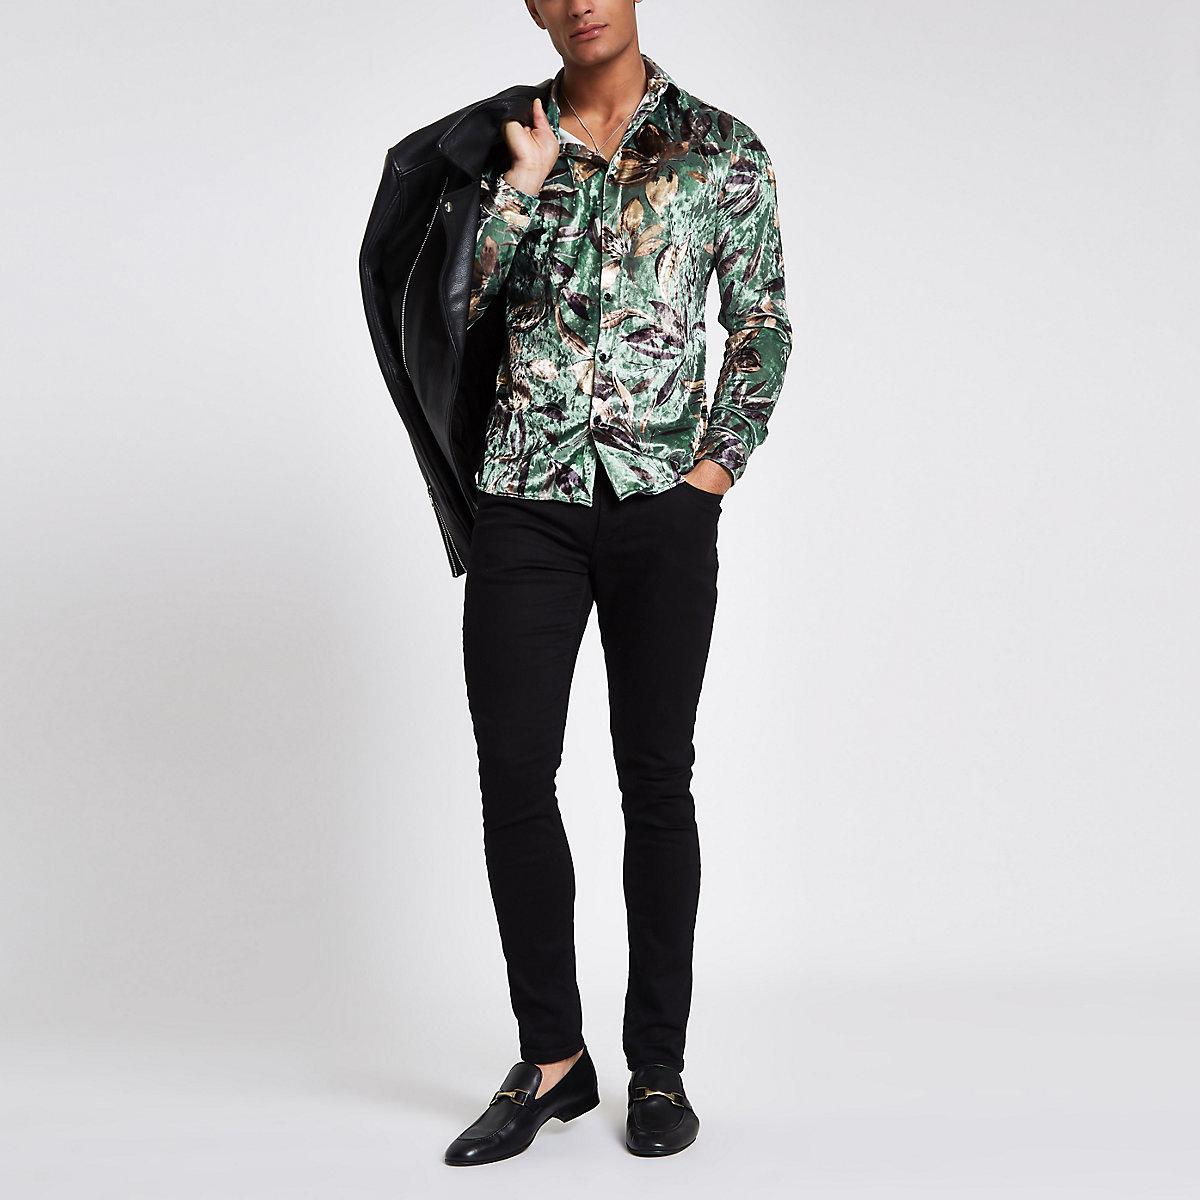 Green floral print velvet button-down shirt